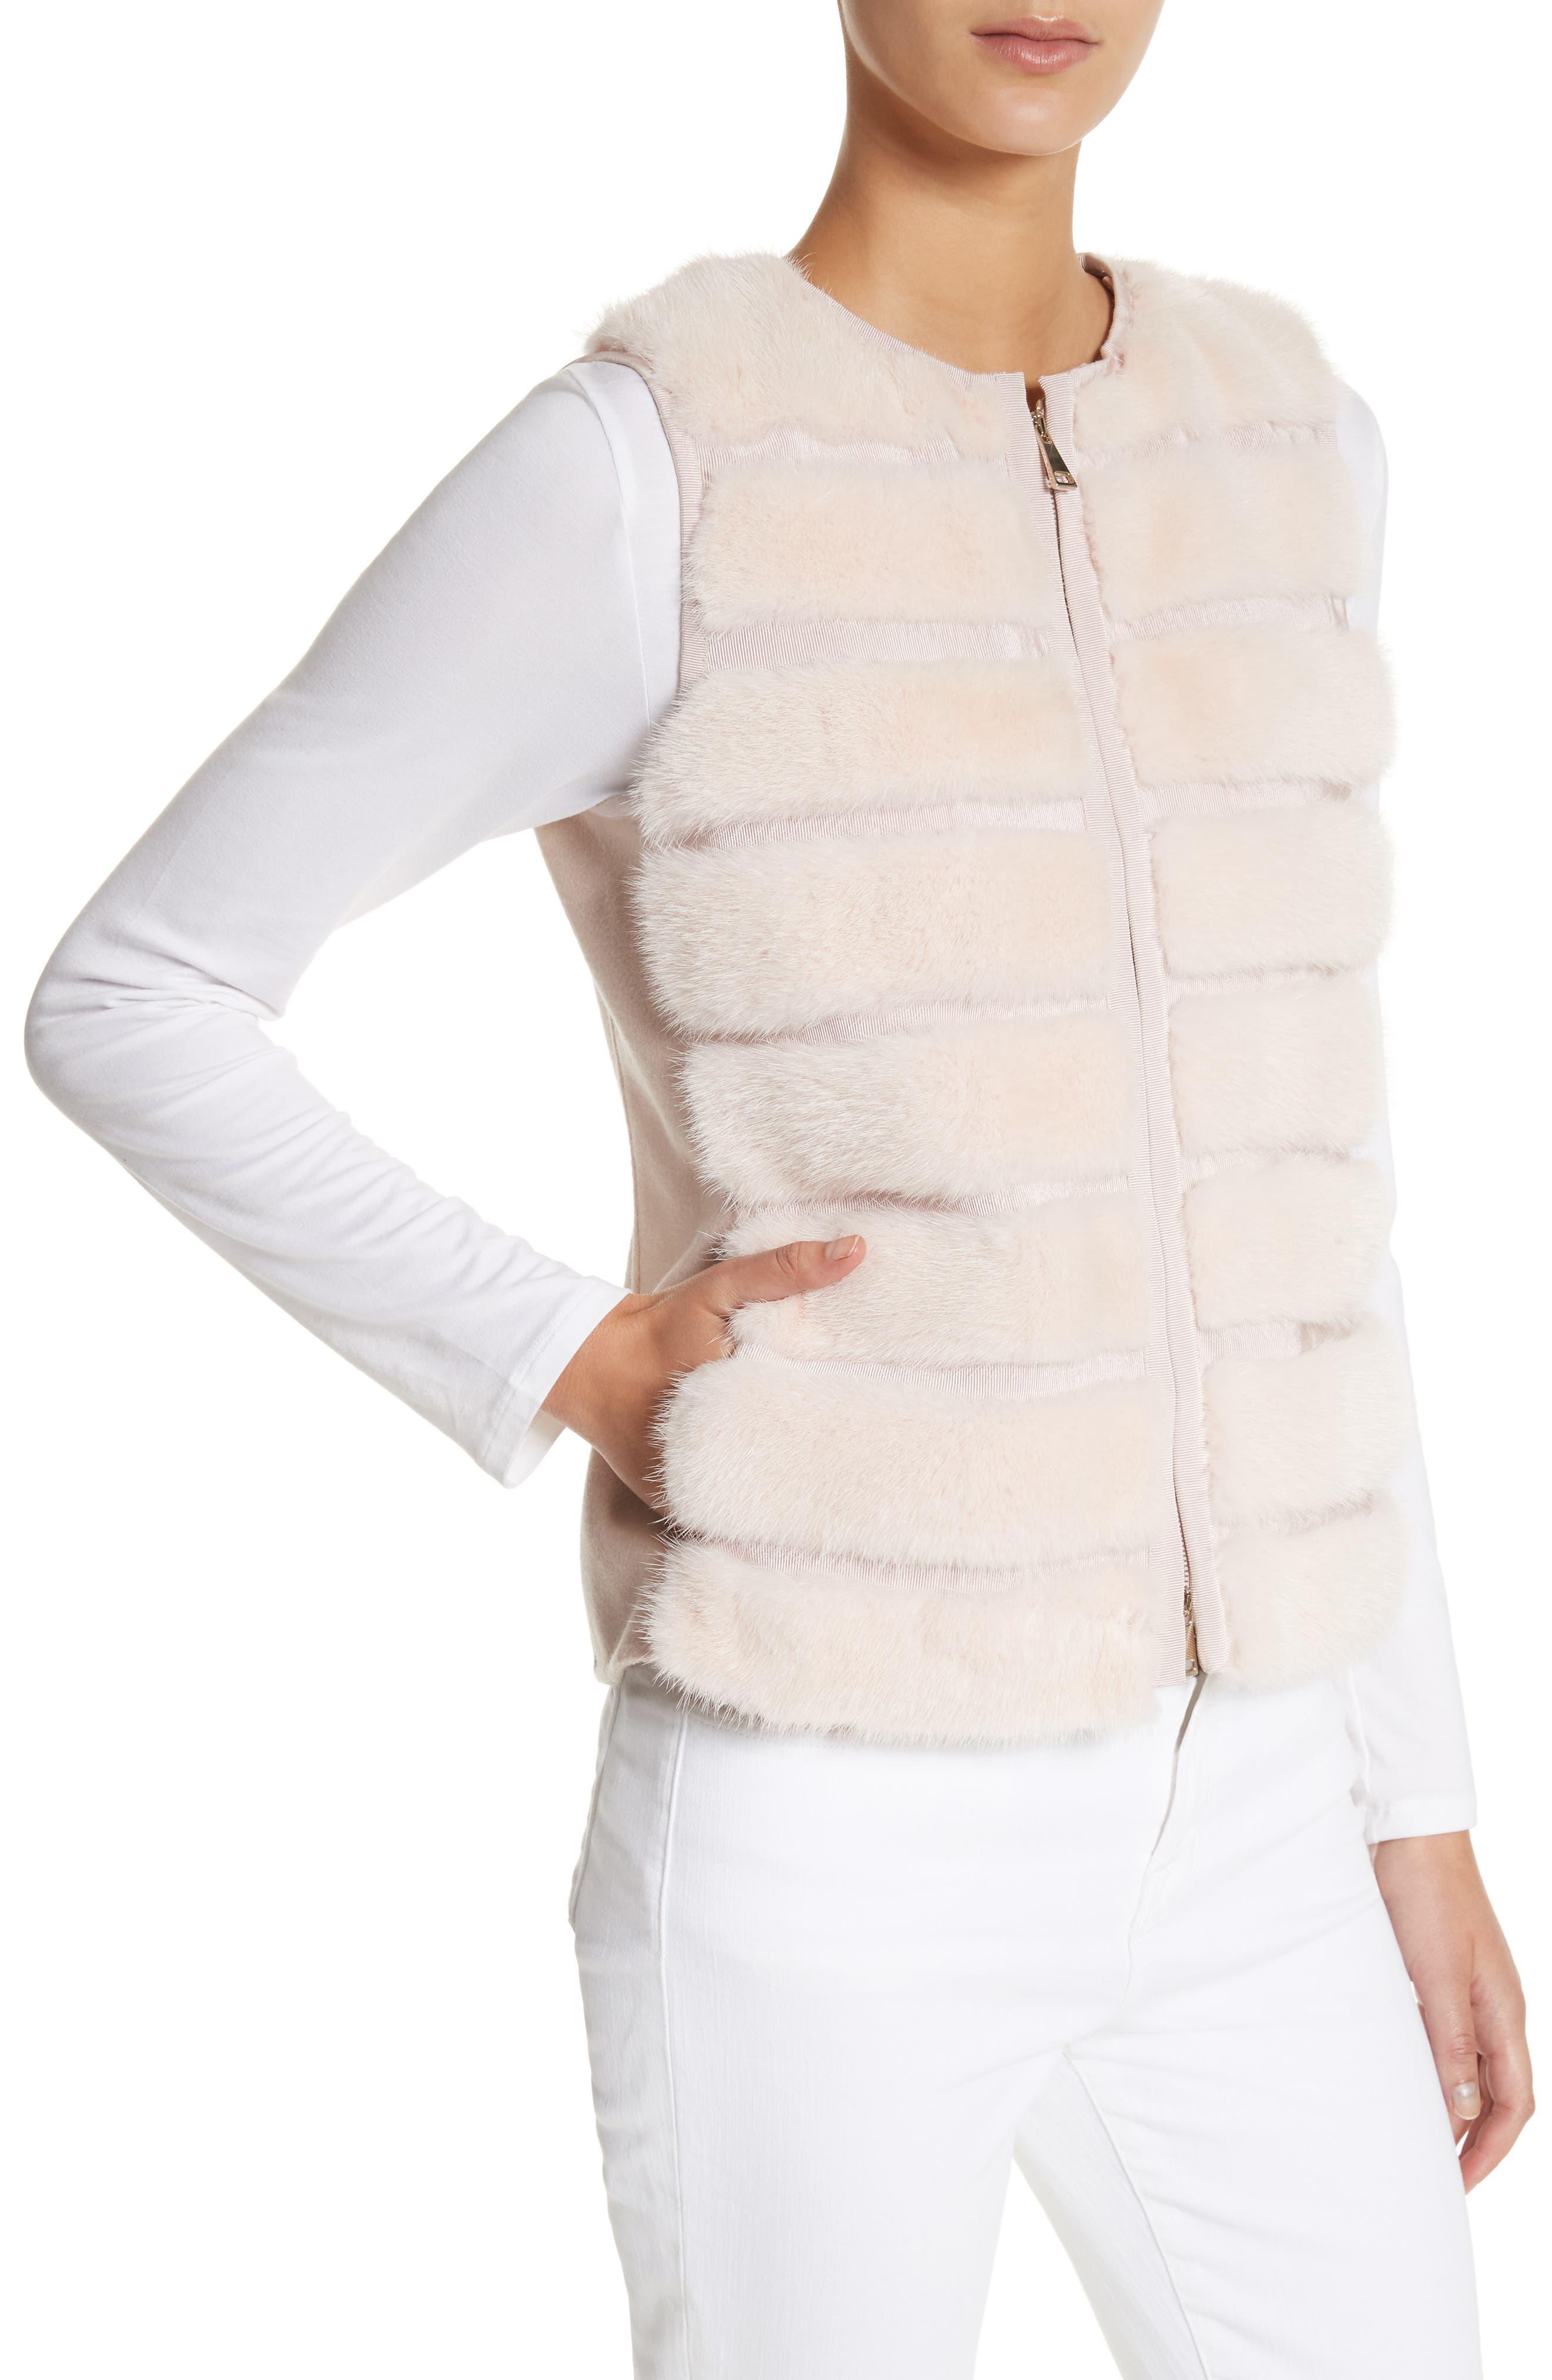 Ametrine Wool & Cashmere Vest with Genuine Mink Fur Trim & Removable Hood,                             Alternate thumbnail 4, color,                             Blush